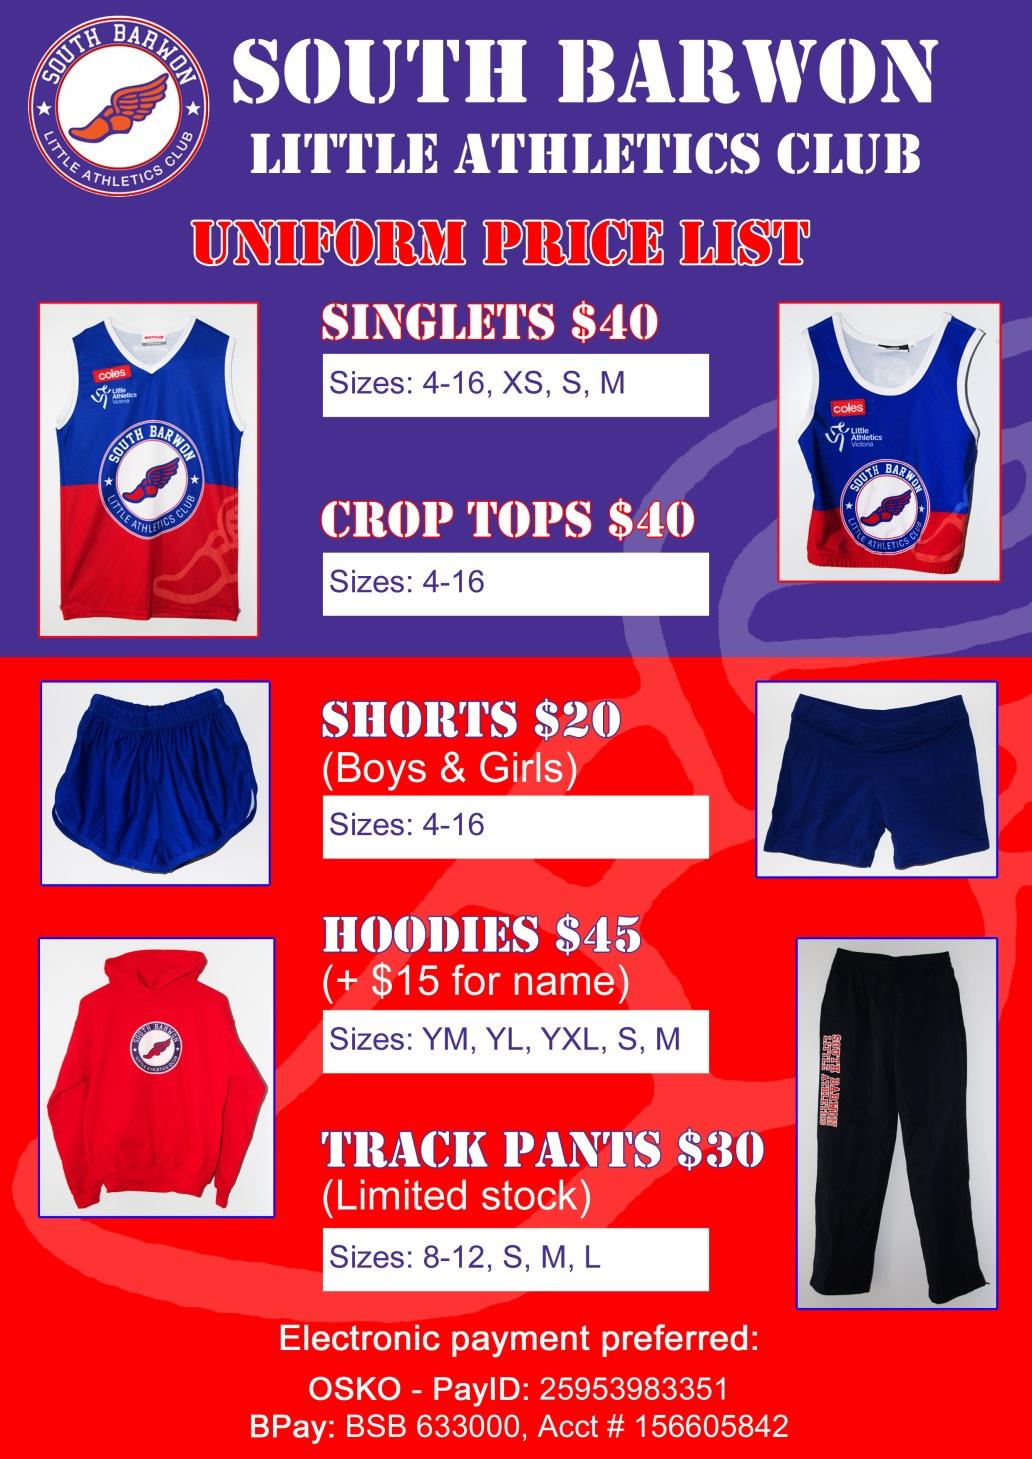 2020-2021 Uniform Price List